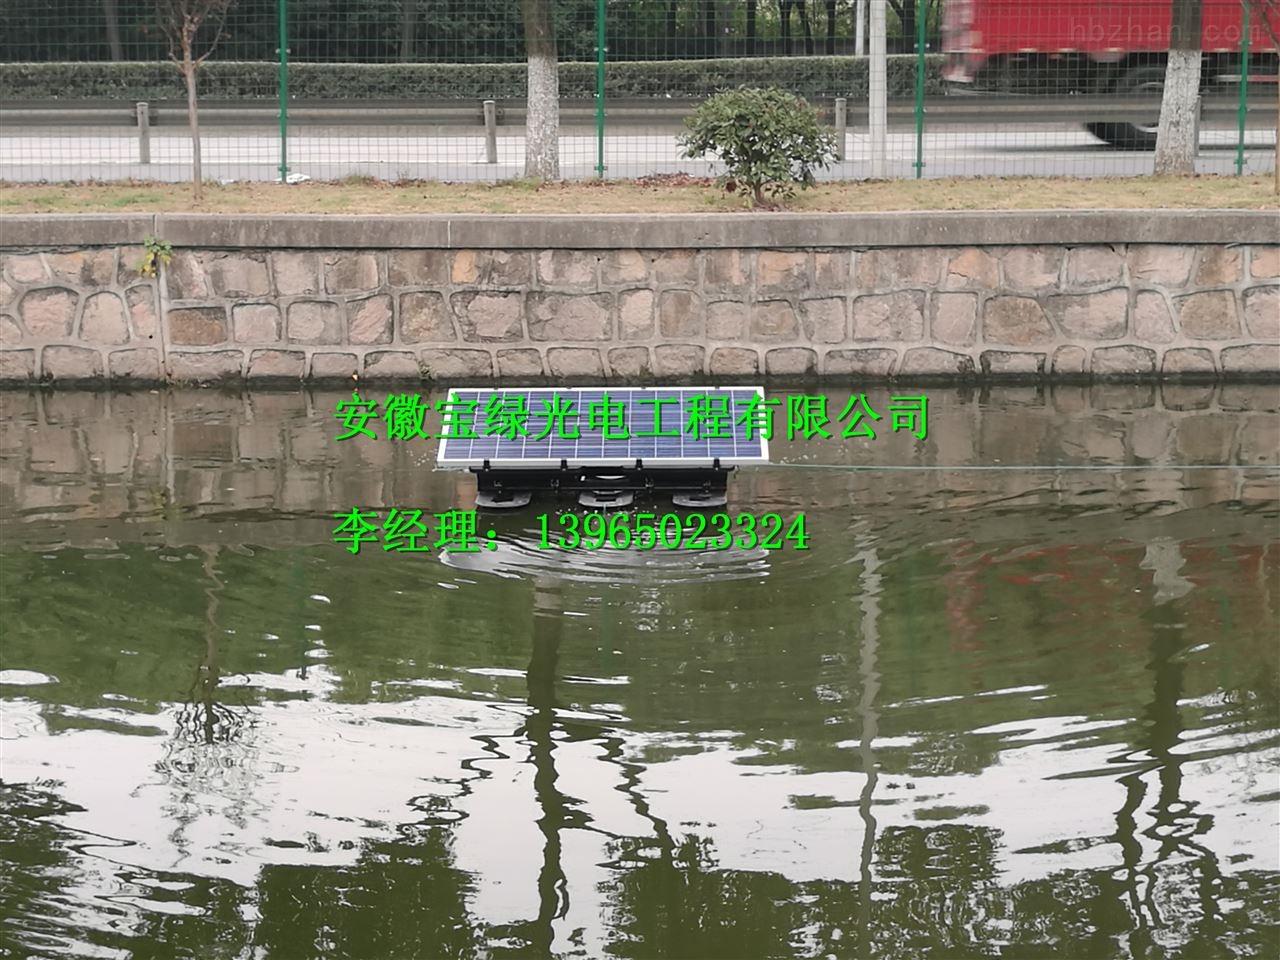 abg/ty-9a 江苏太阳能曝气机_景观水处理设备-中国